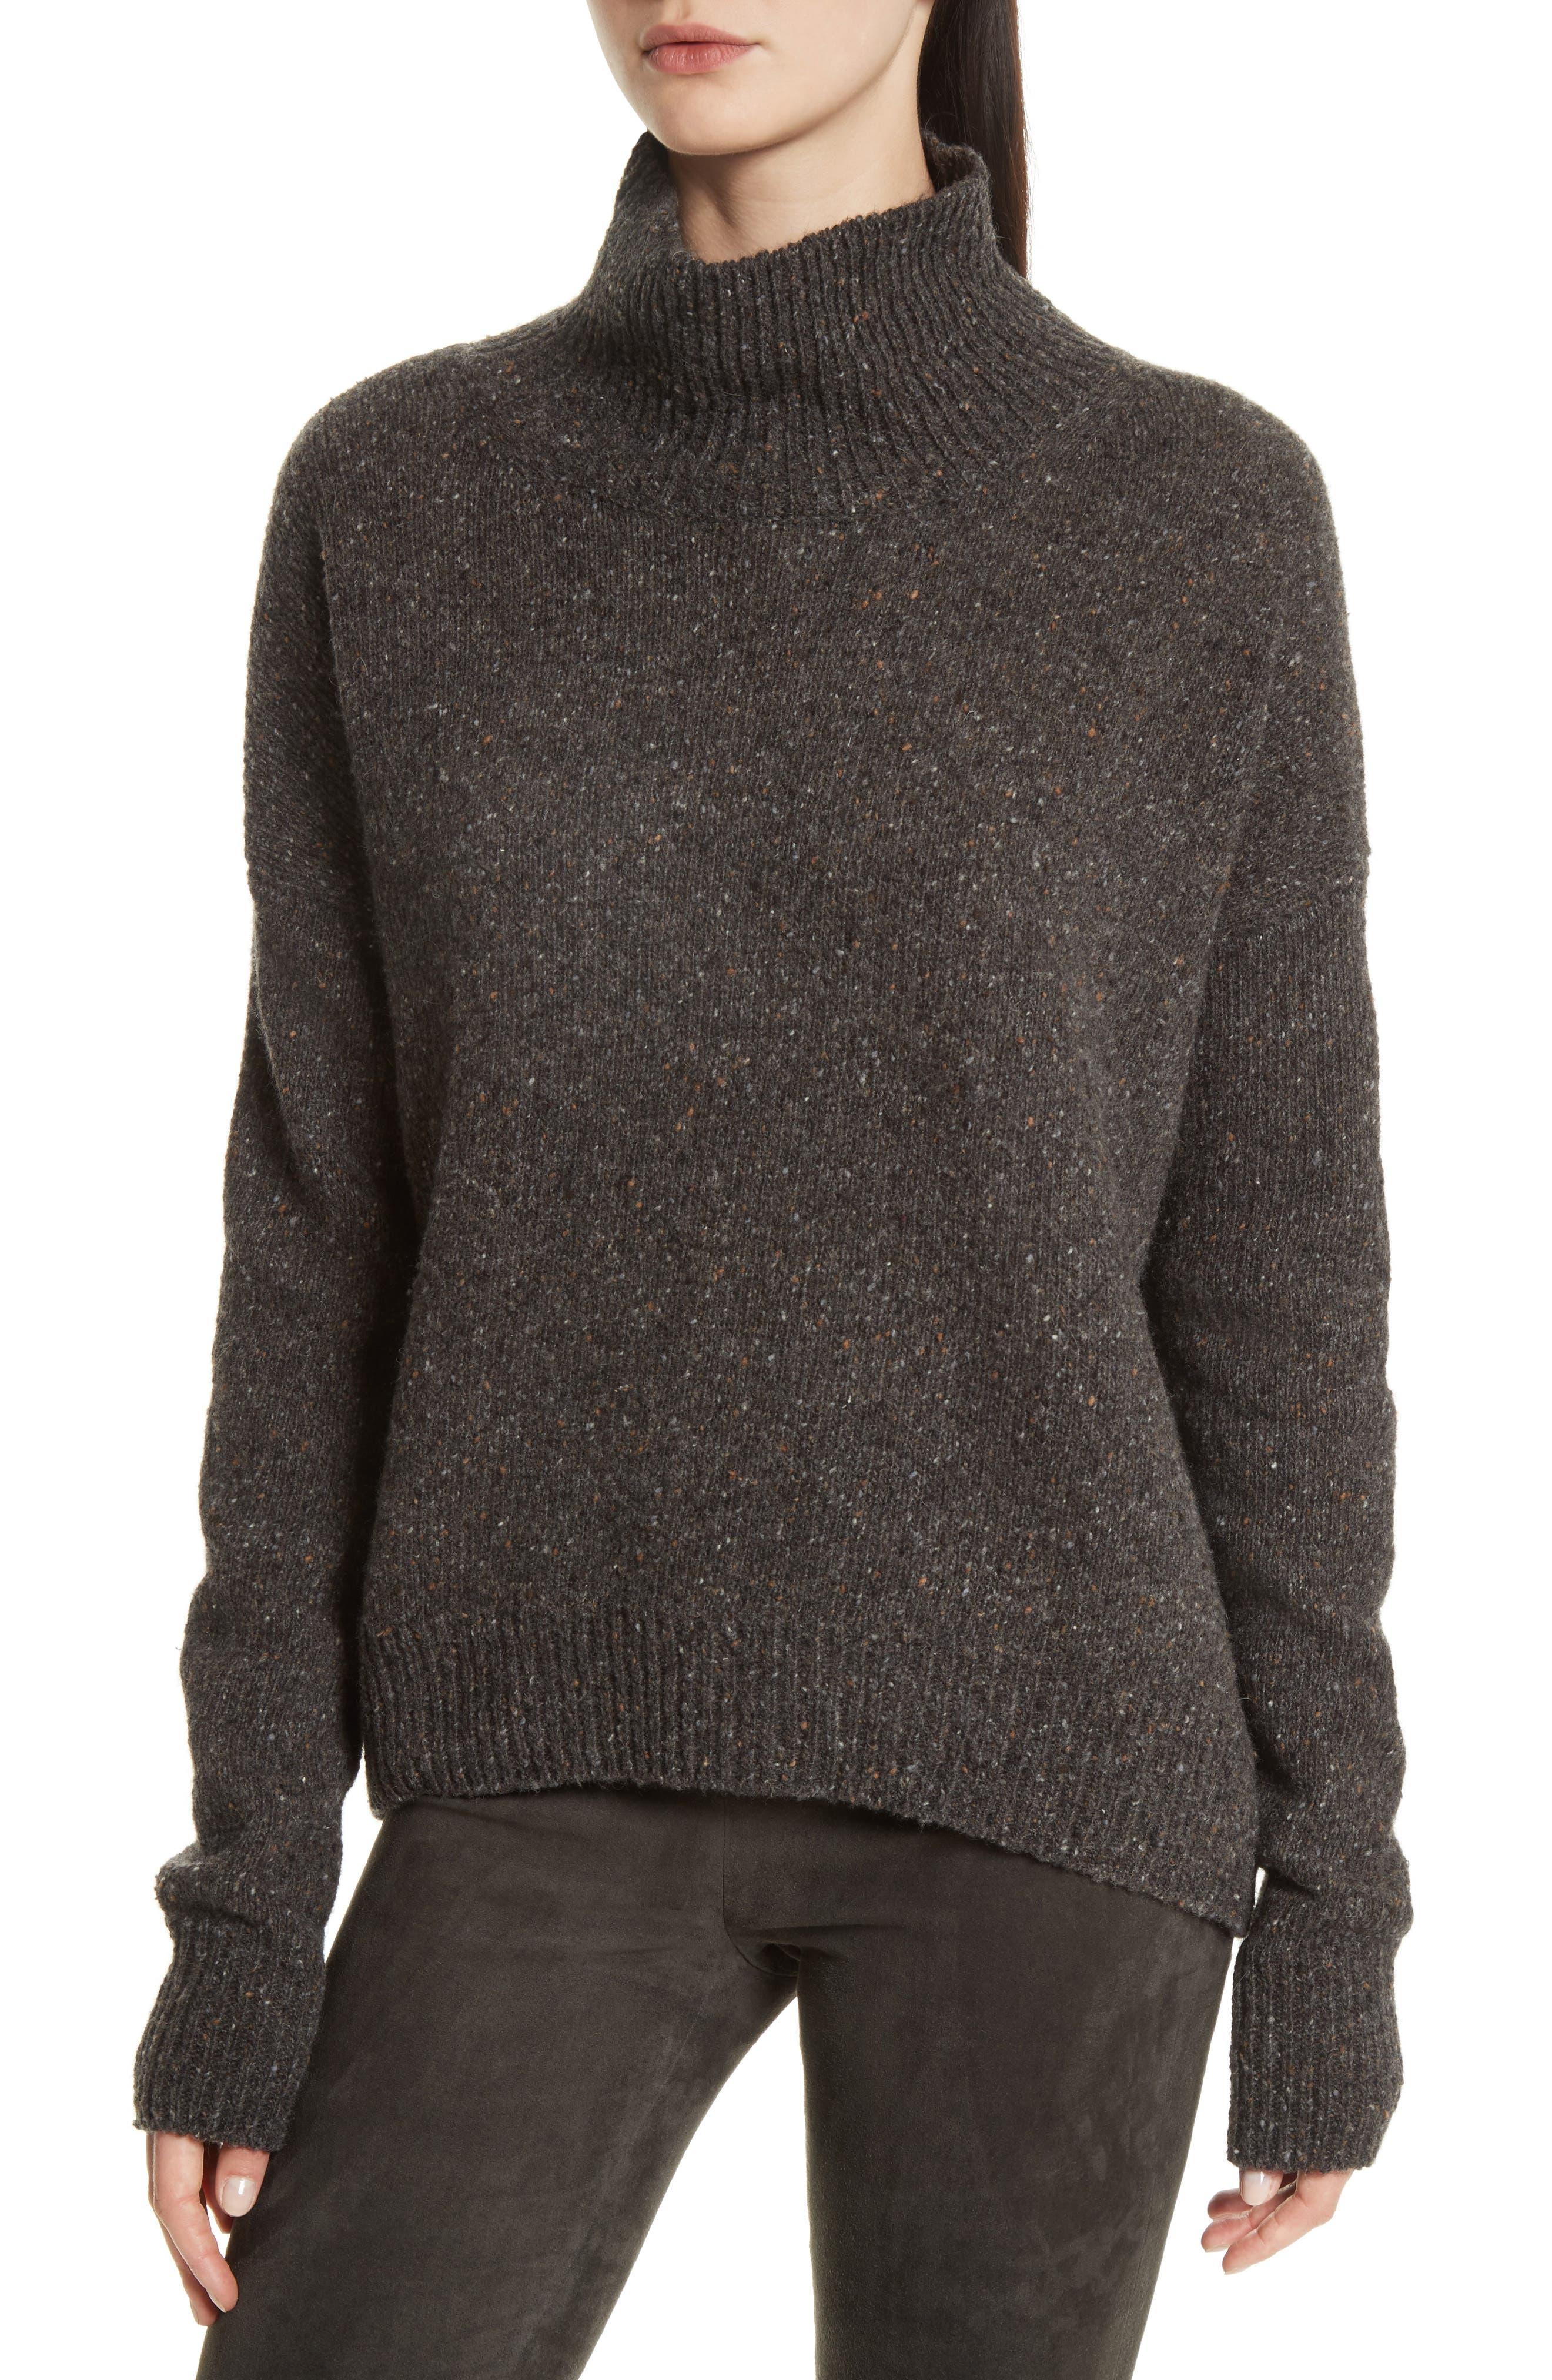 Cashmere Turtleneck Sweater,                             Main thumbnail 1, color,                             Charcoal